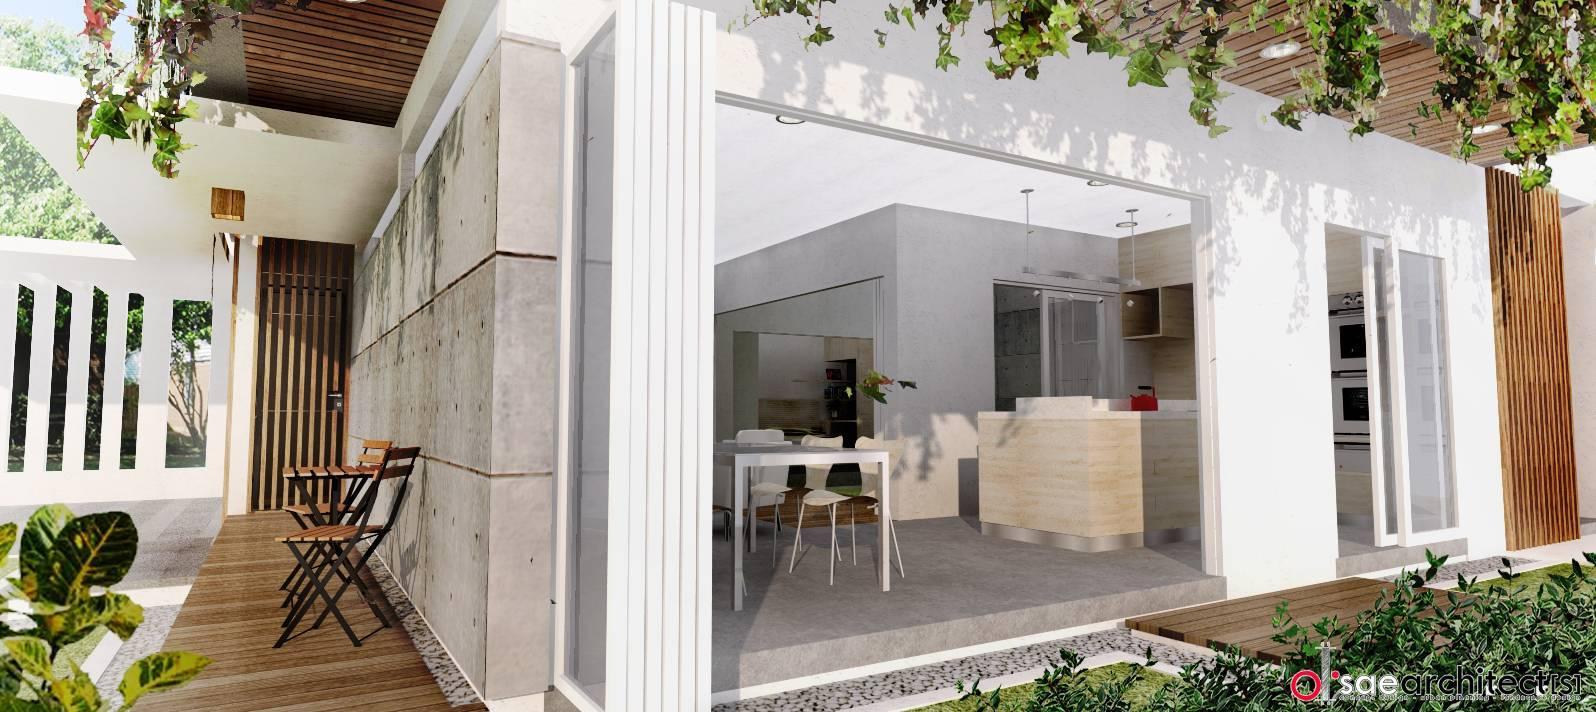 Tito Renarto M. Verdant View House At Bsd Tangerang  Tangerang  Bsd-5-2016-04-30Exterior-03   2025